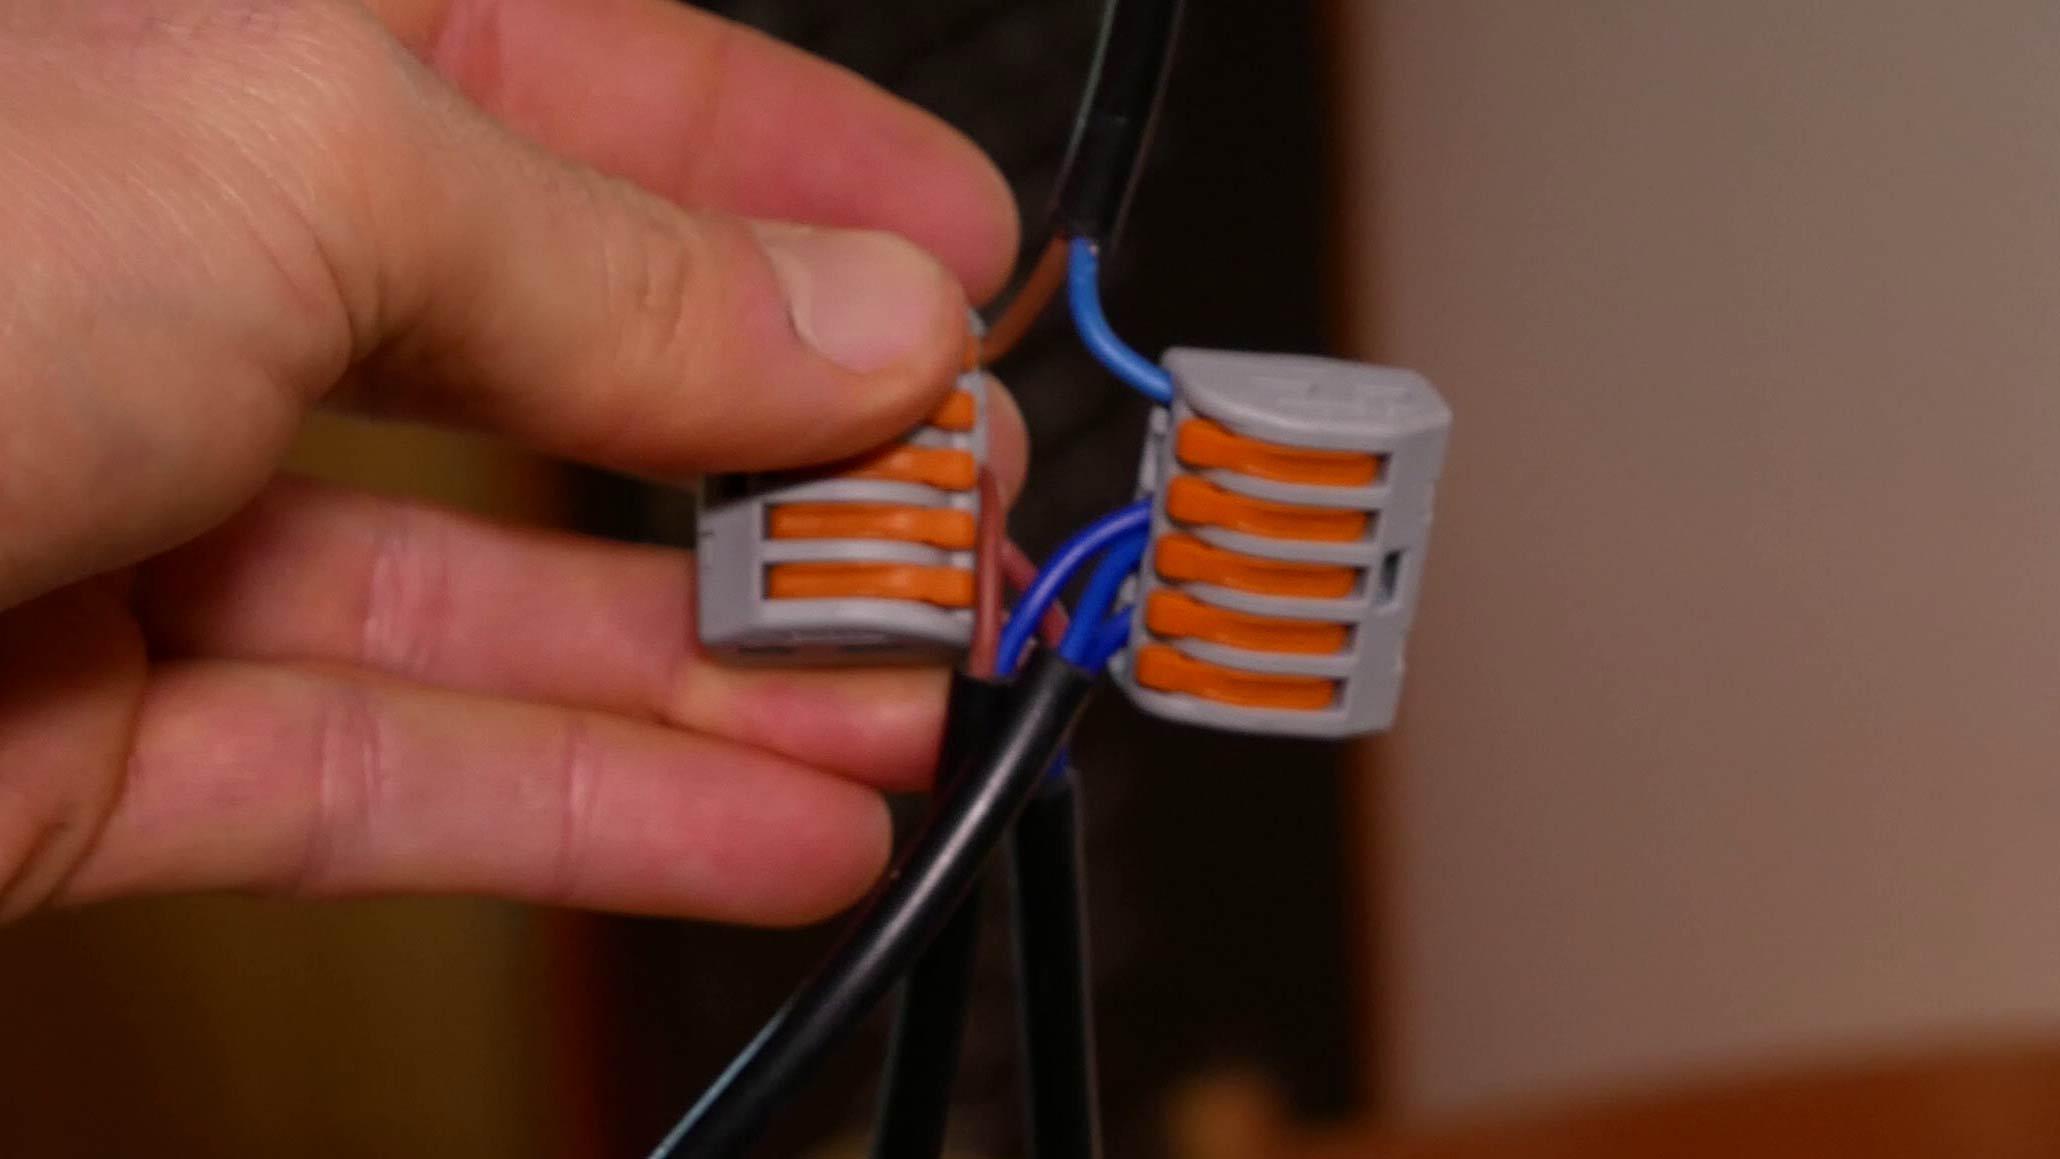 Gut bekannt Lampe anschließen - ein Kabel, mehrere Lampen verkabeln - Made by TJ56